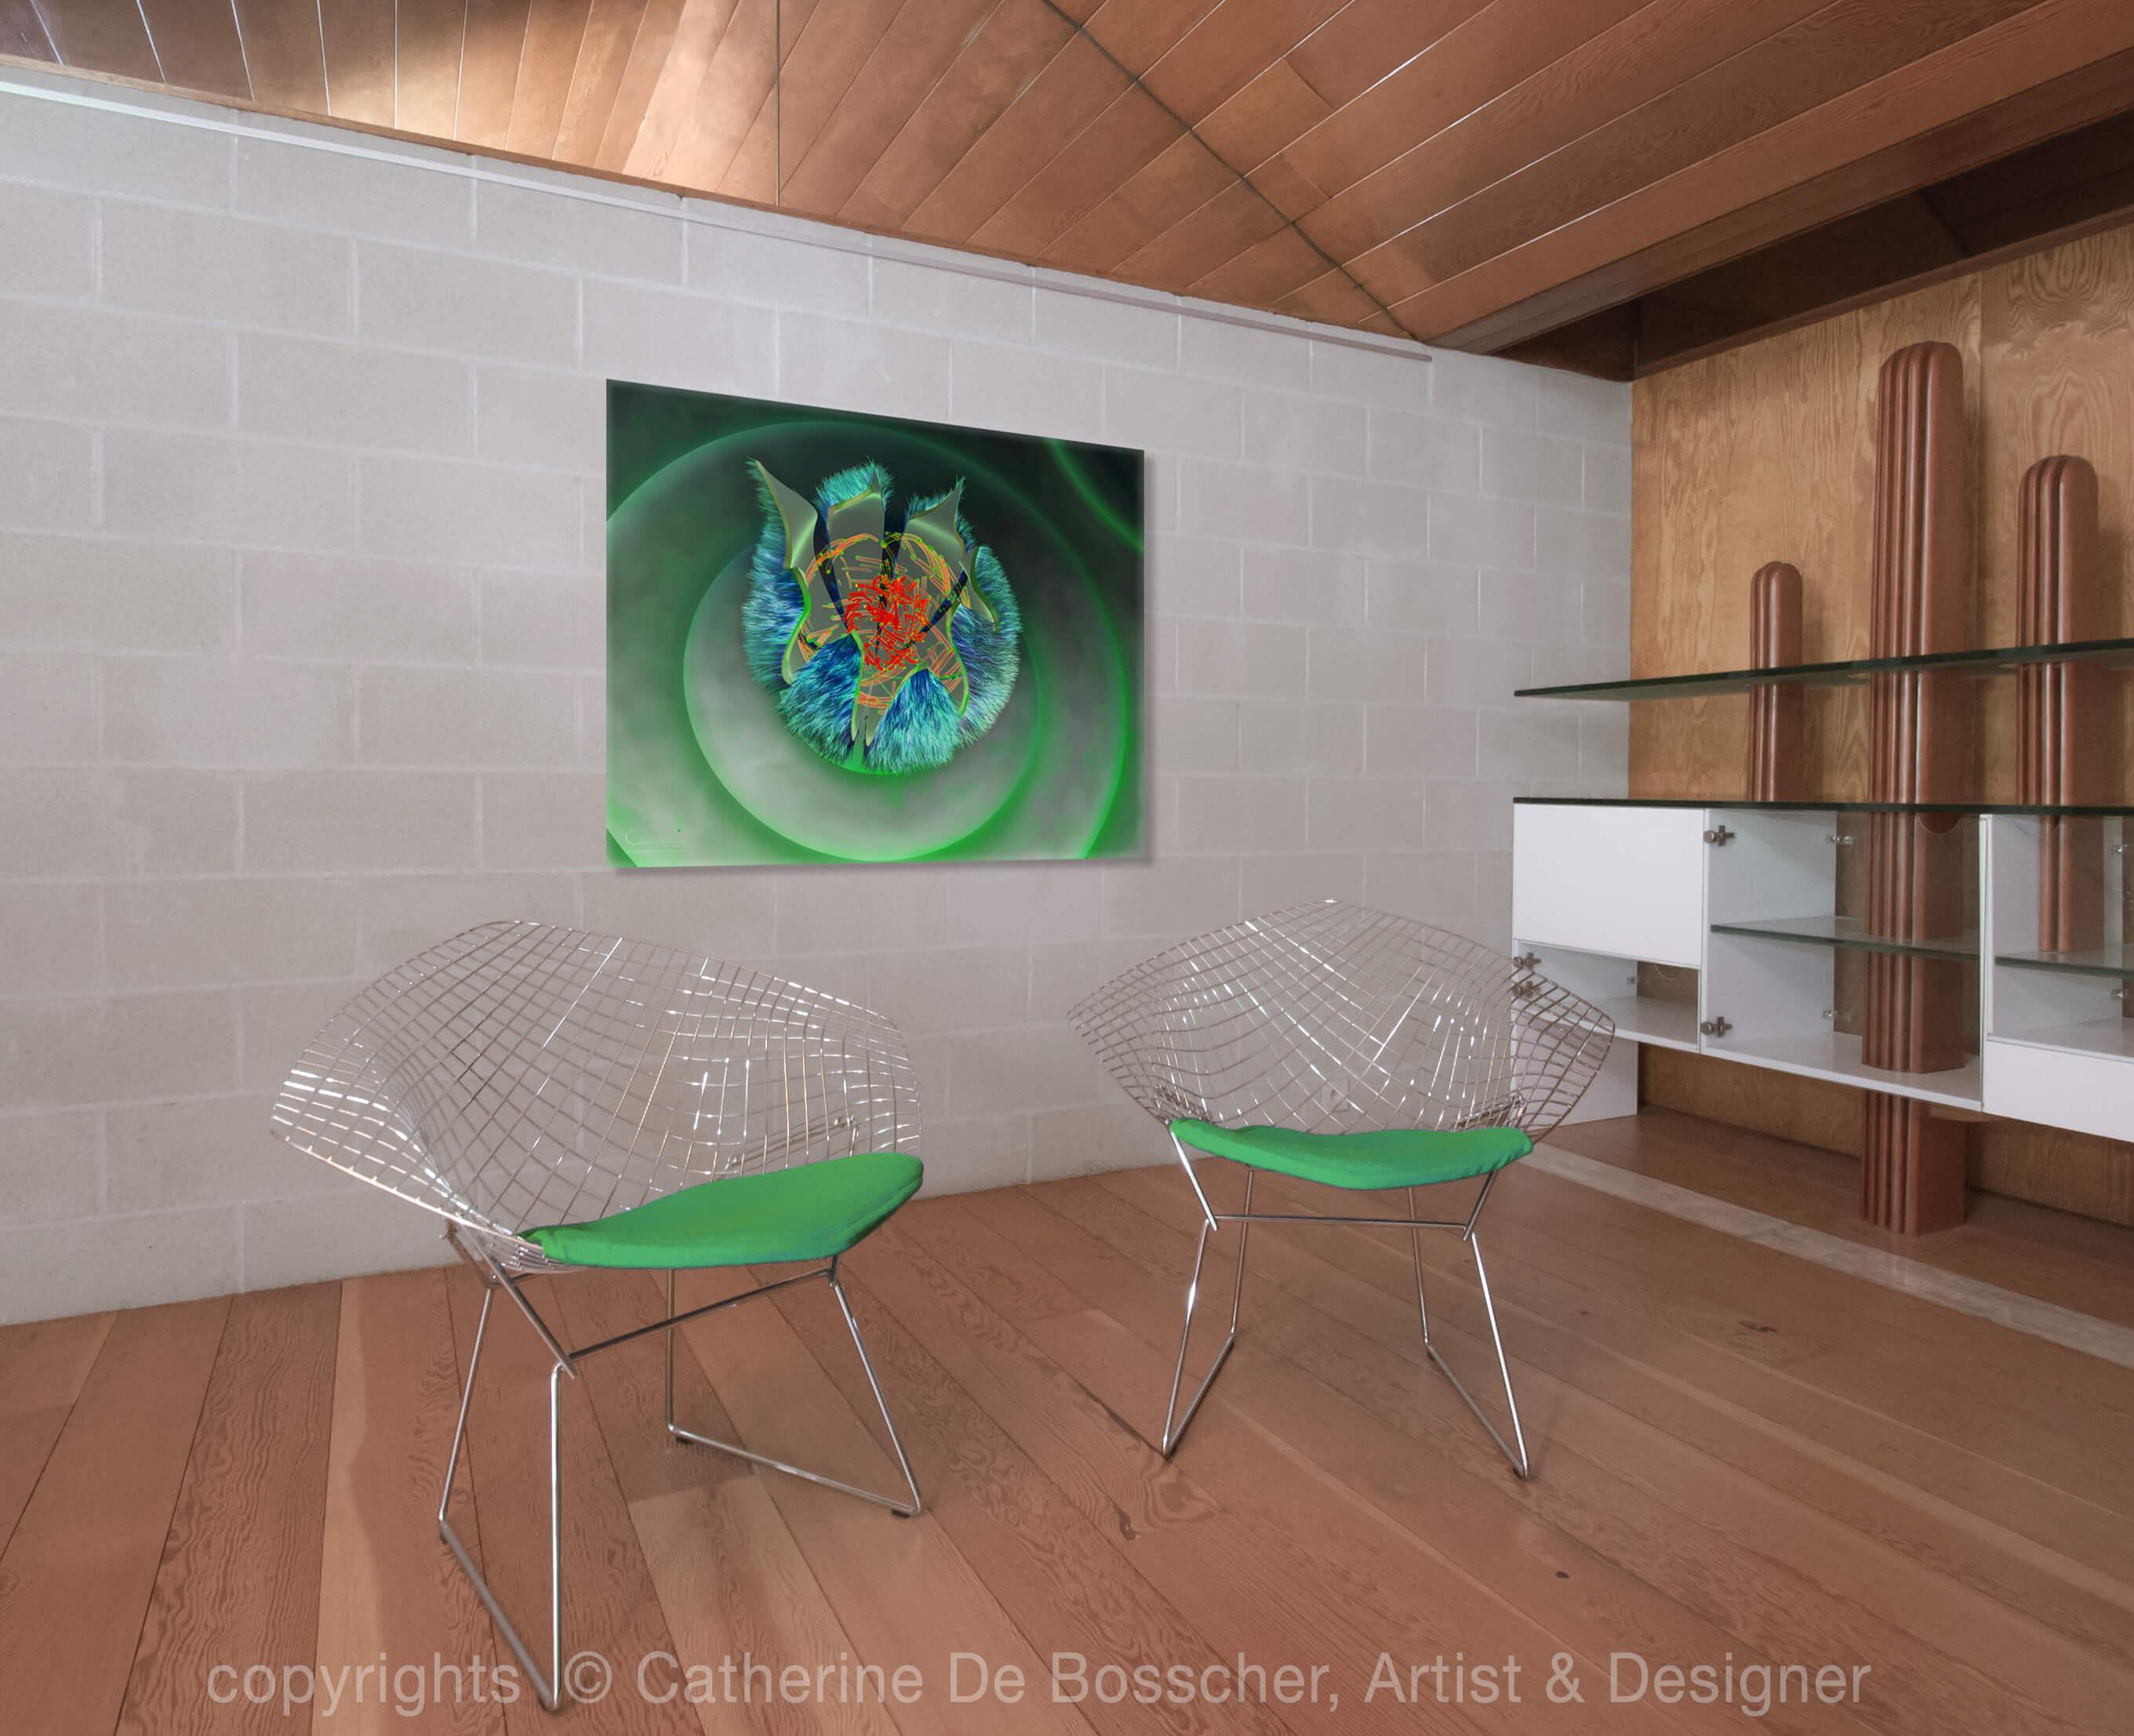 GREEN CAPSULE 3 Artwork 125 x 100 cm by Catherine De Bosscher